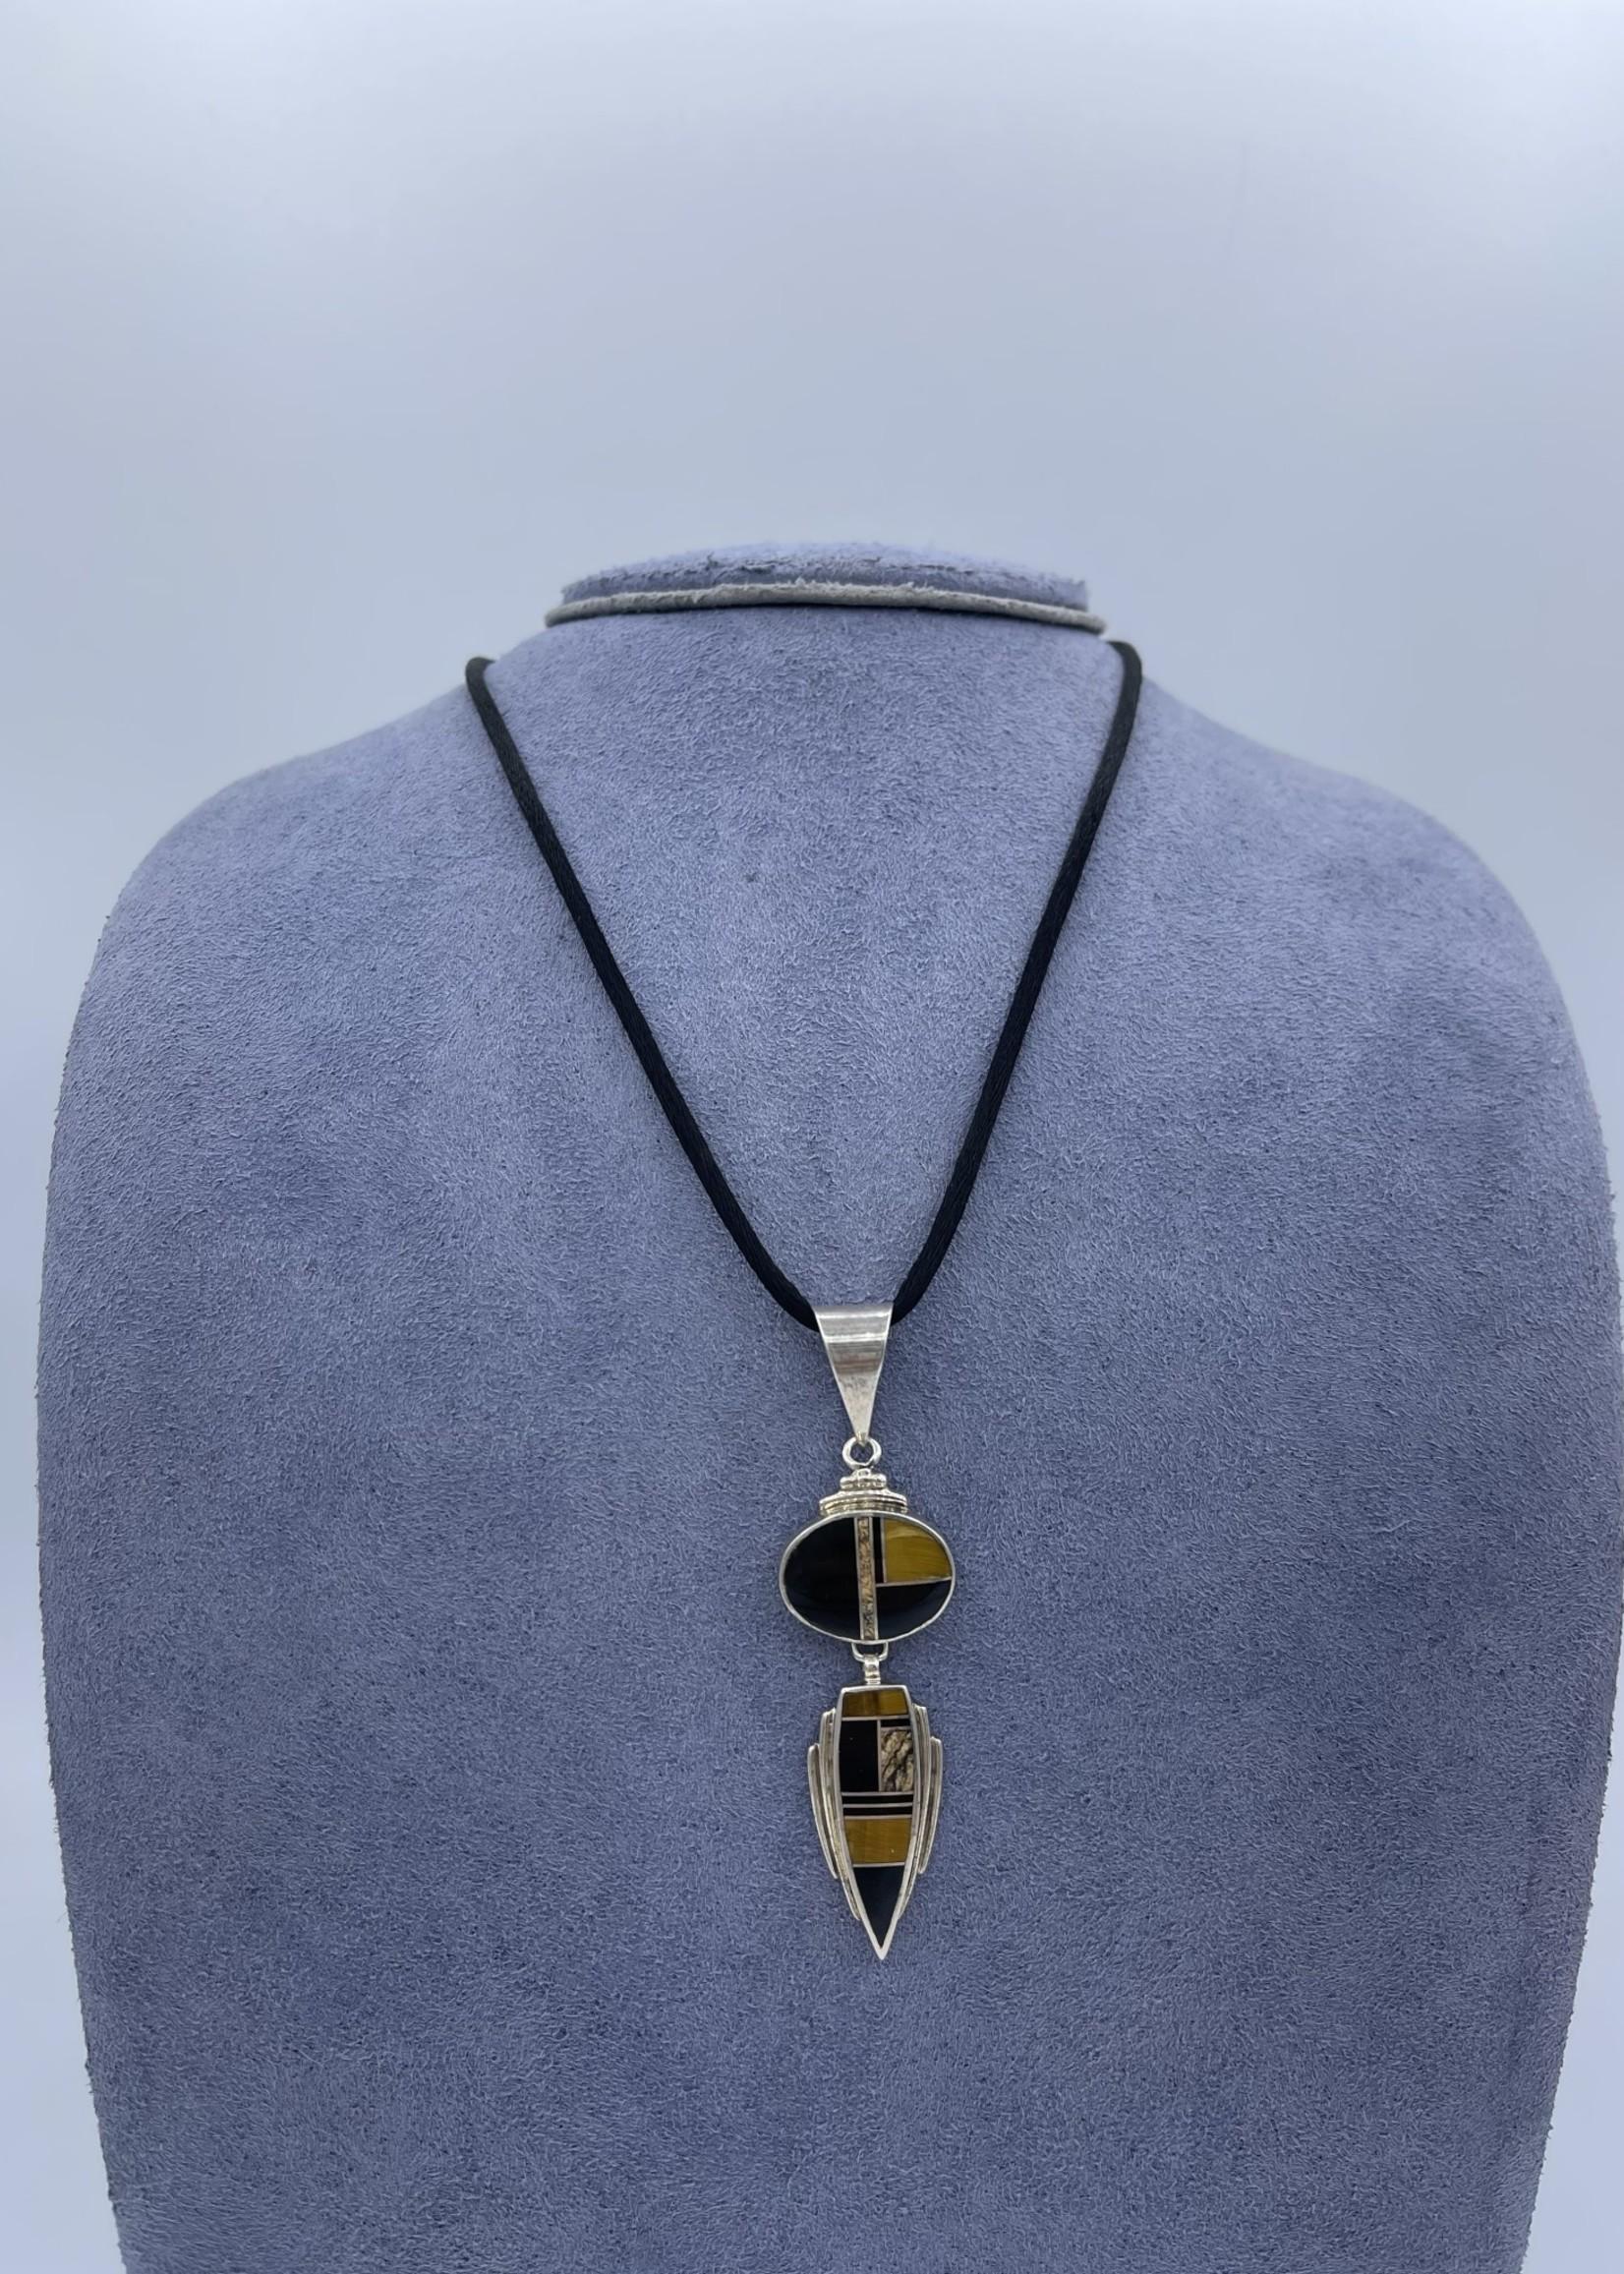 CJ Designs Fashion Jewelry Pendant